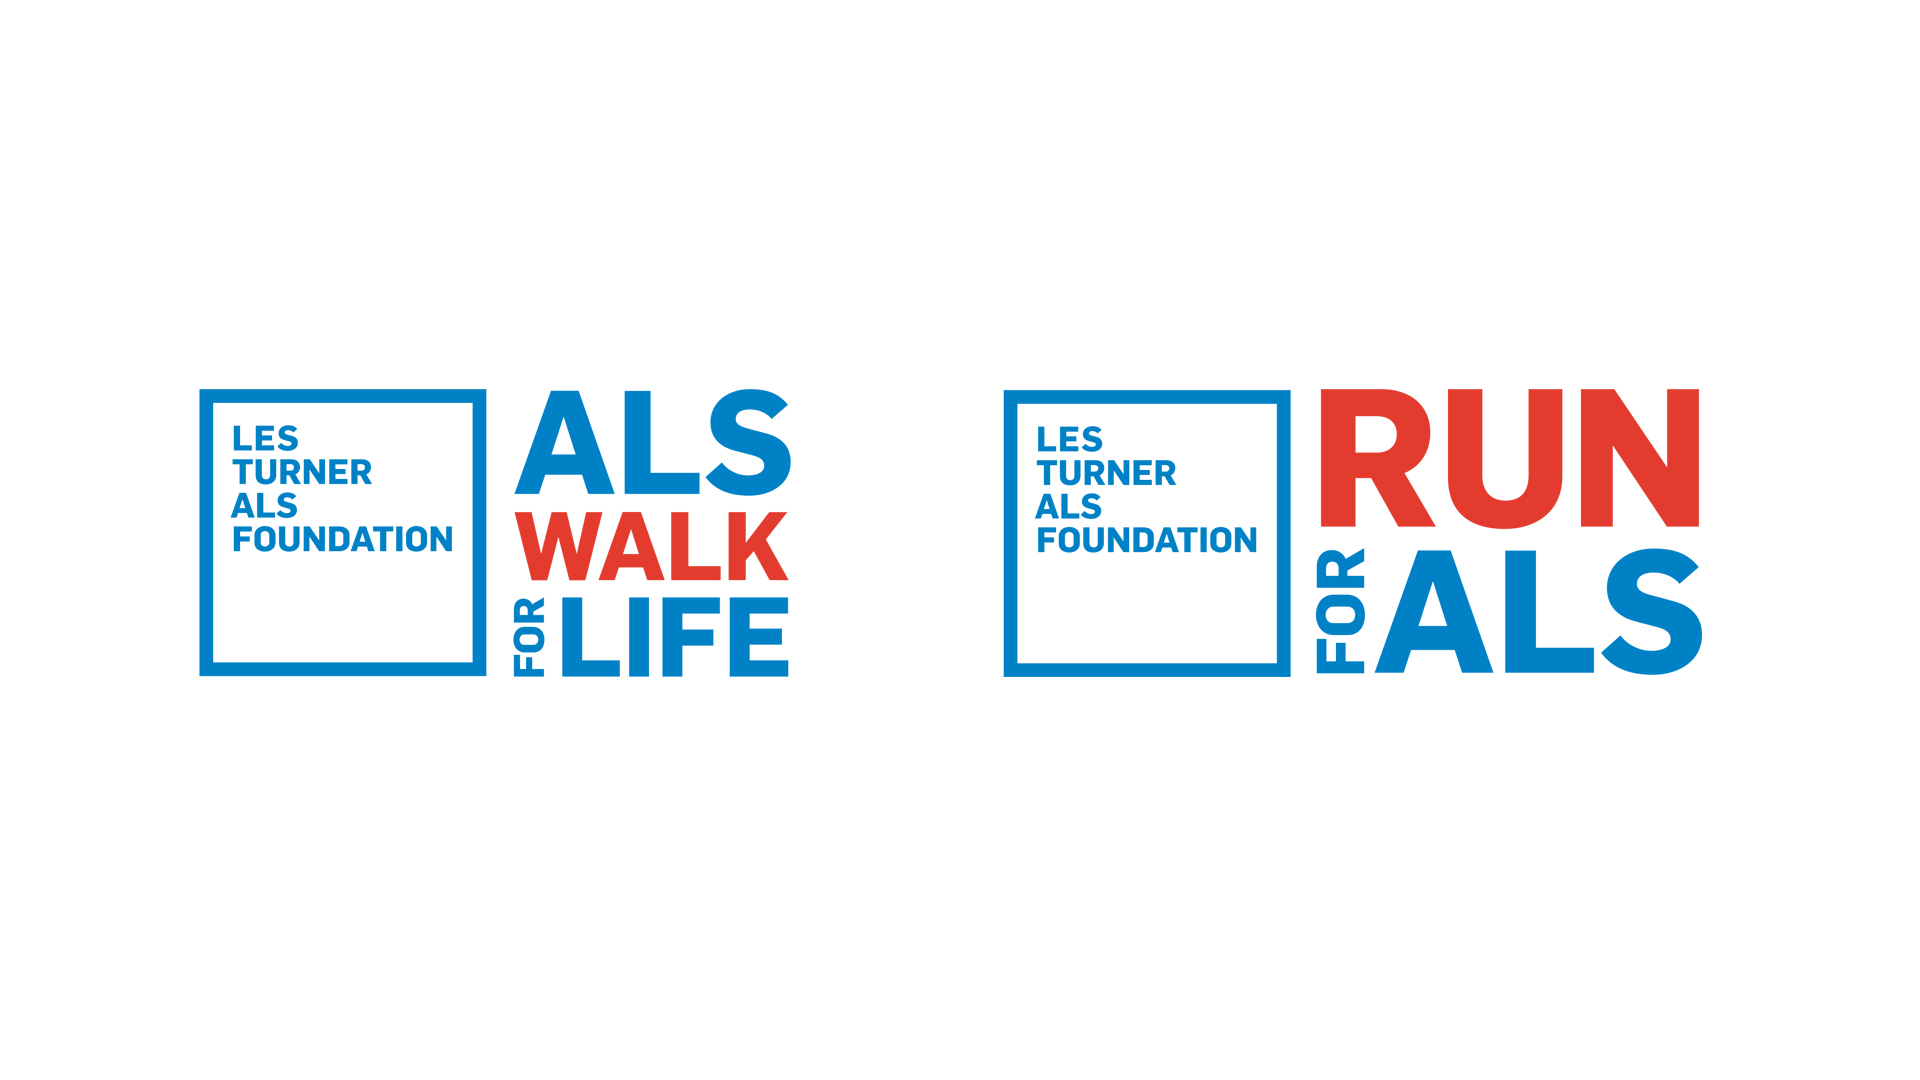 ALS-walk+run.jpg